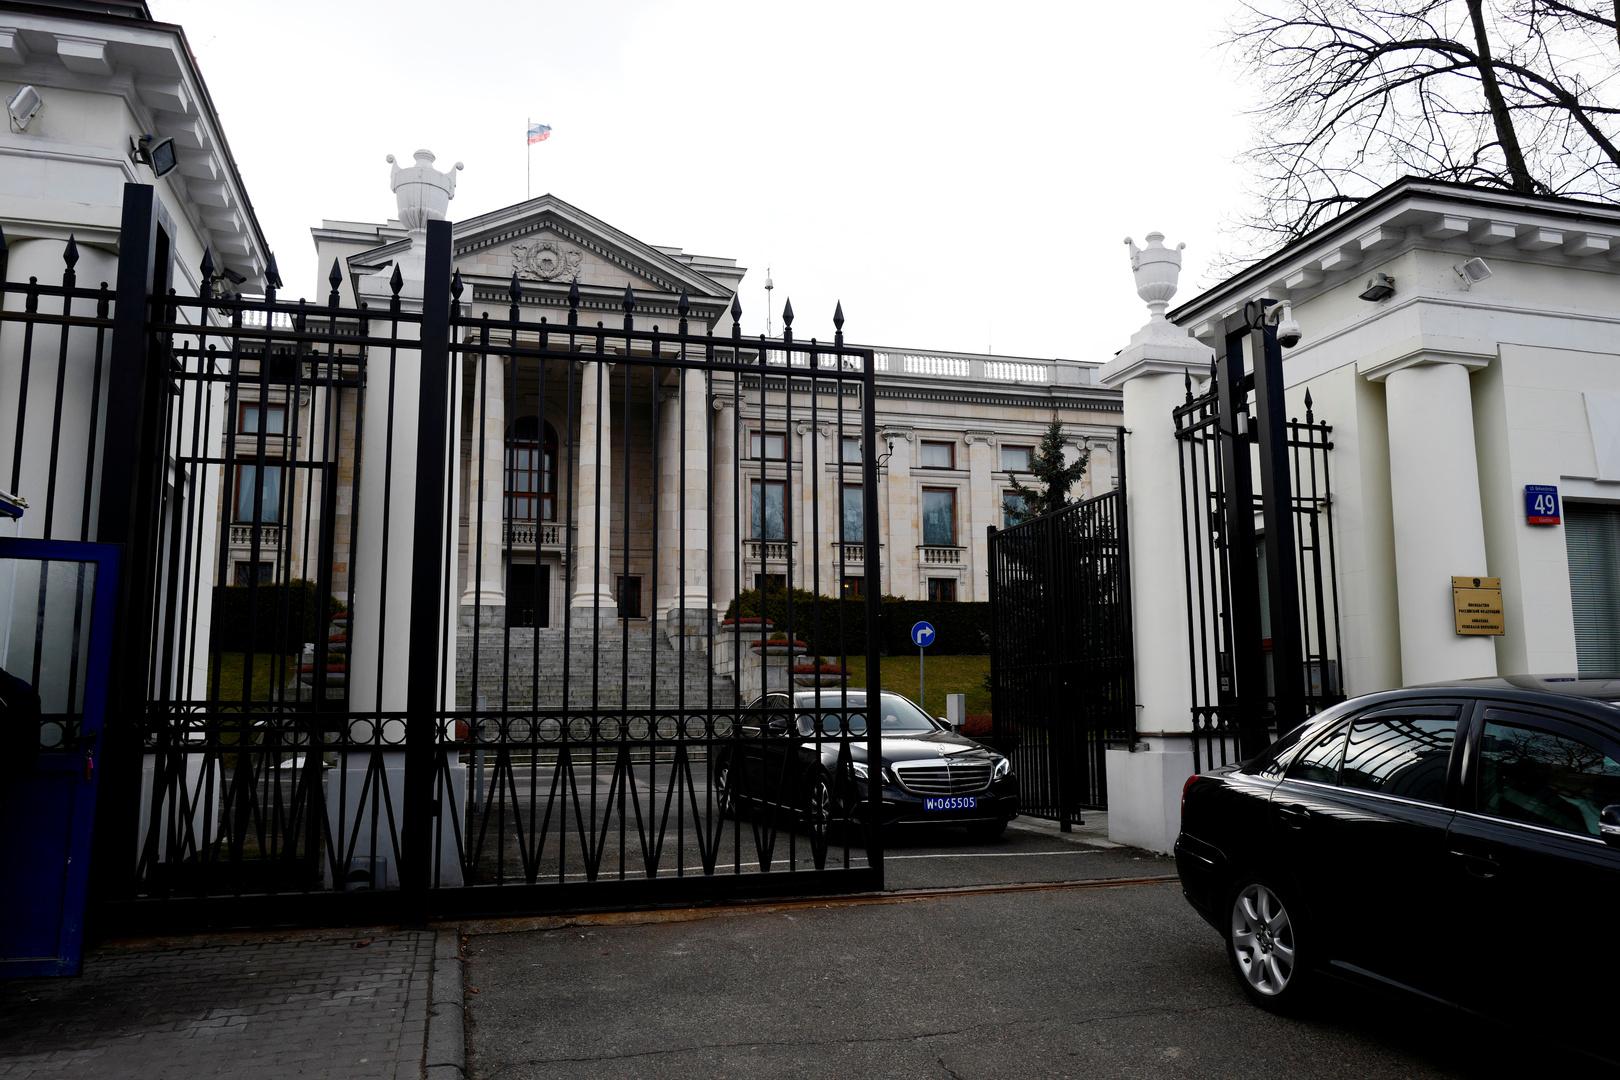 بولندا تطرد 3 دبلوماسيين روس